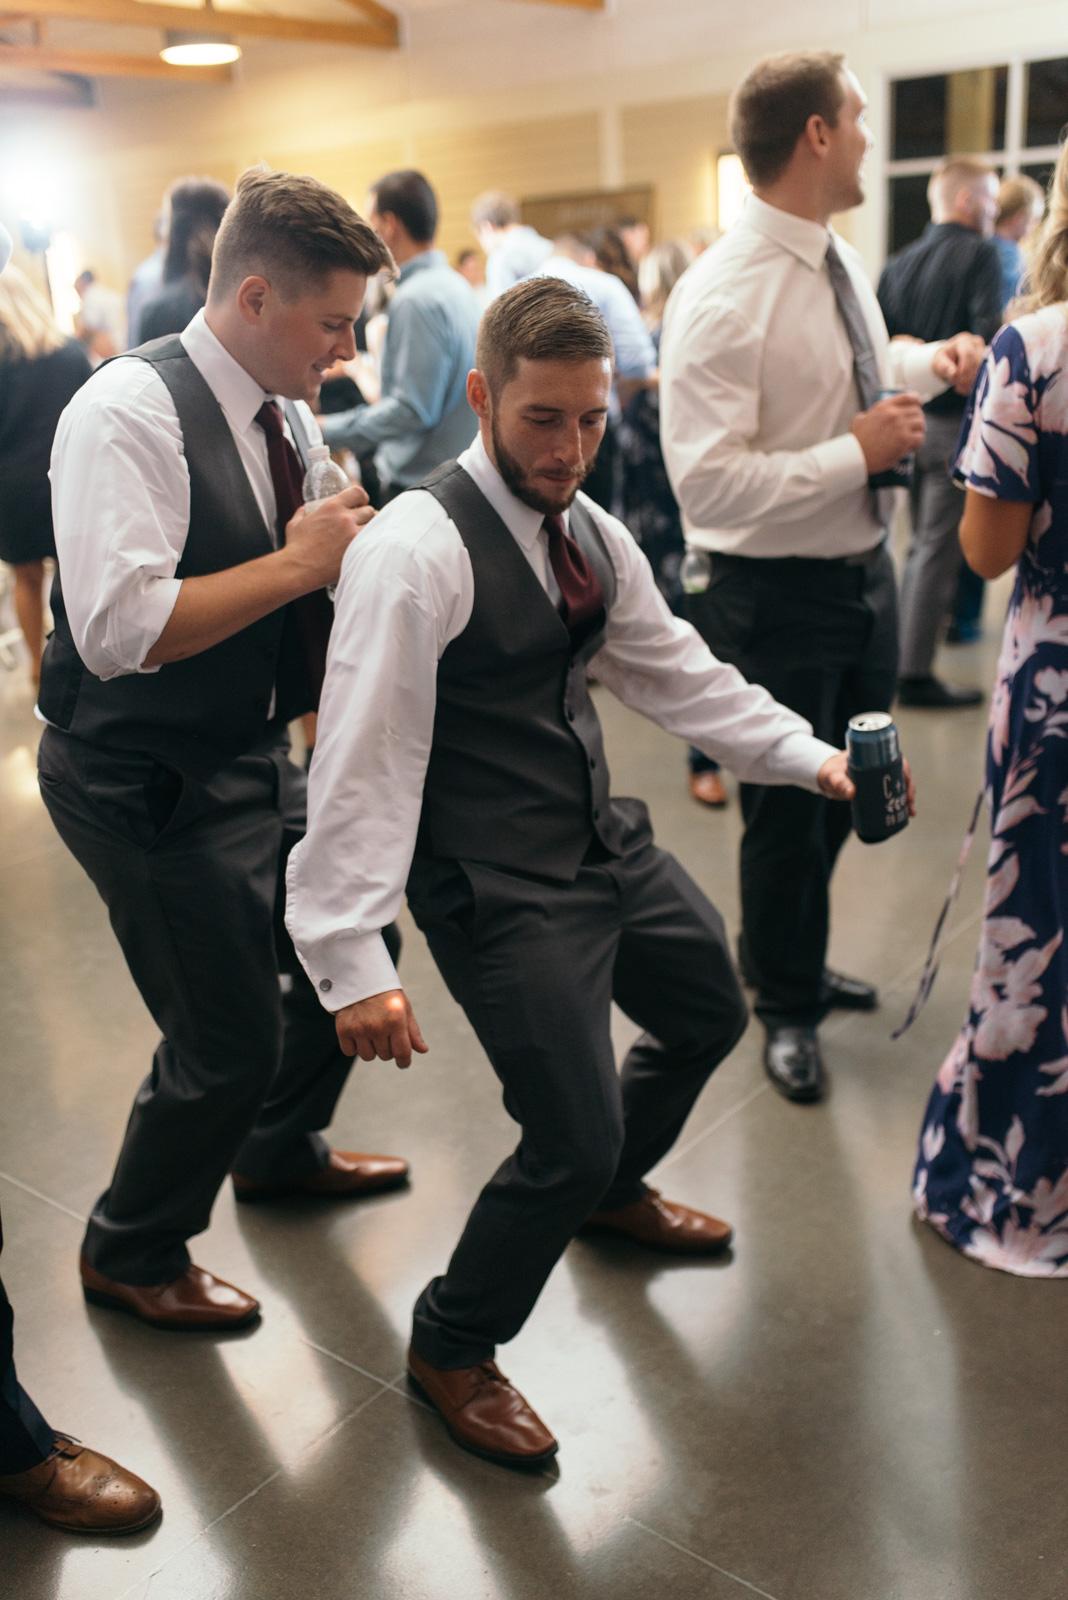 wedding guests dancing cedar rapids wedding reception